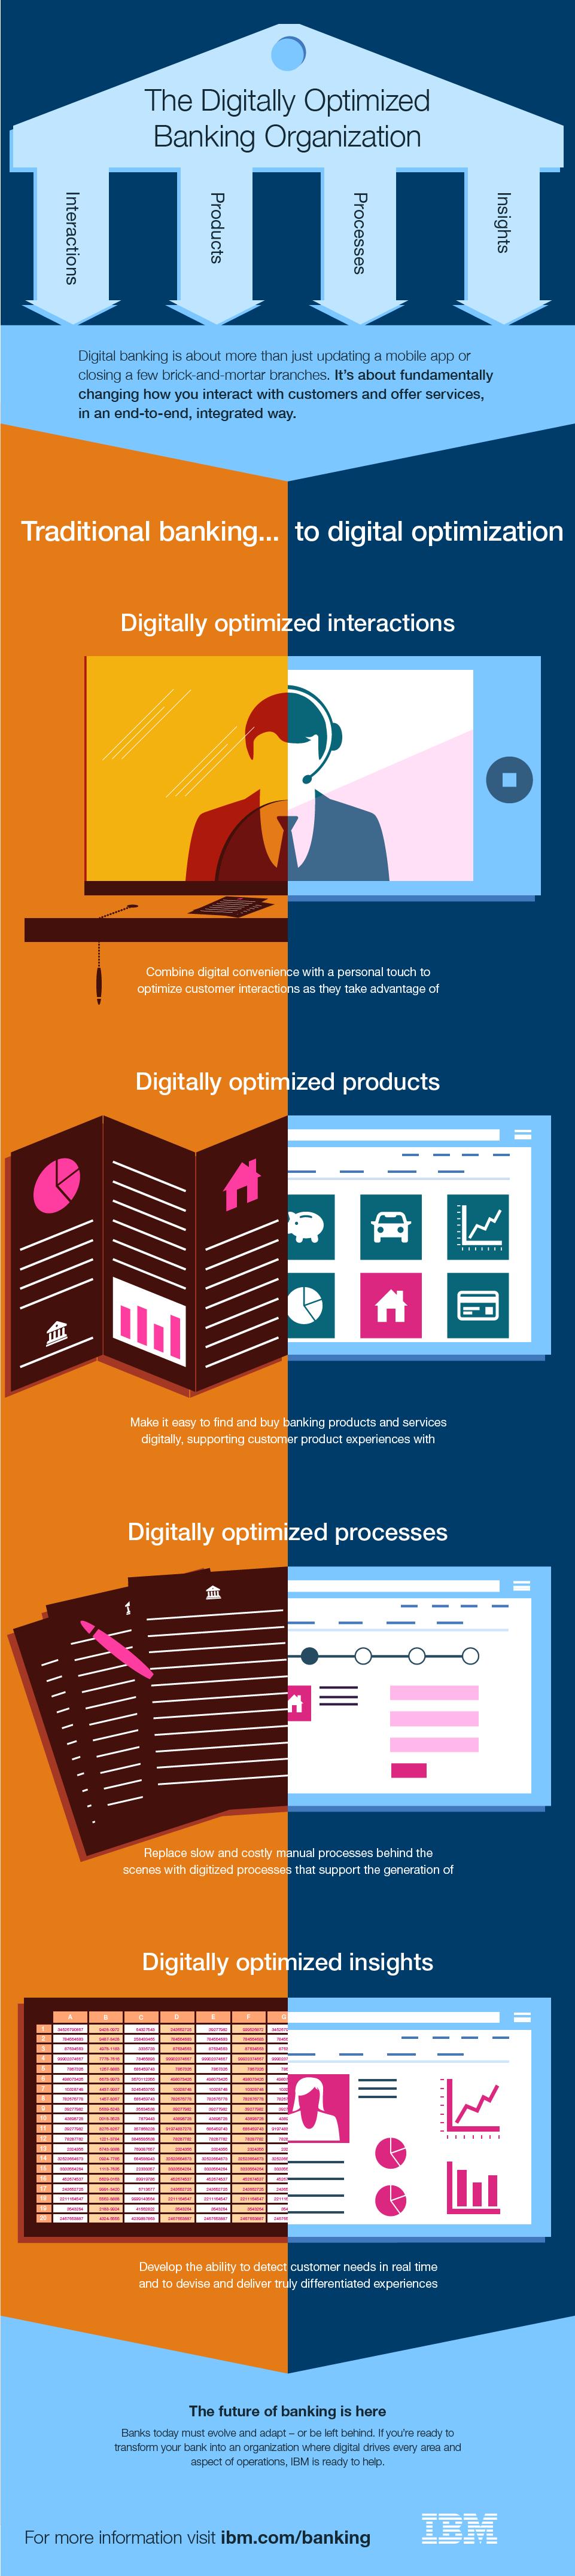 IBM Banking Infographic Disruptive innovation, Banking